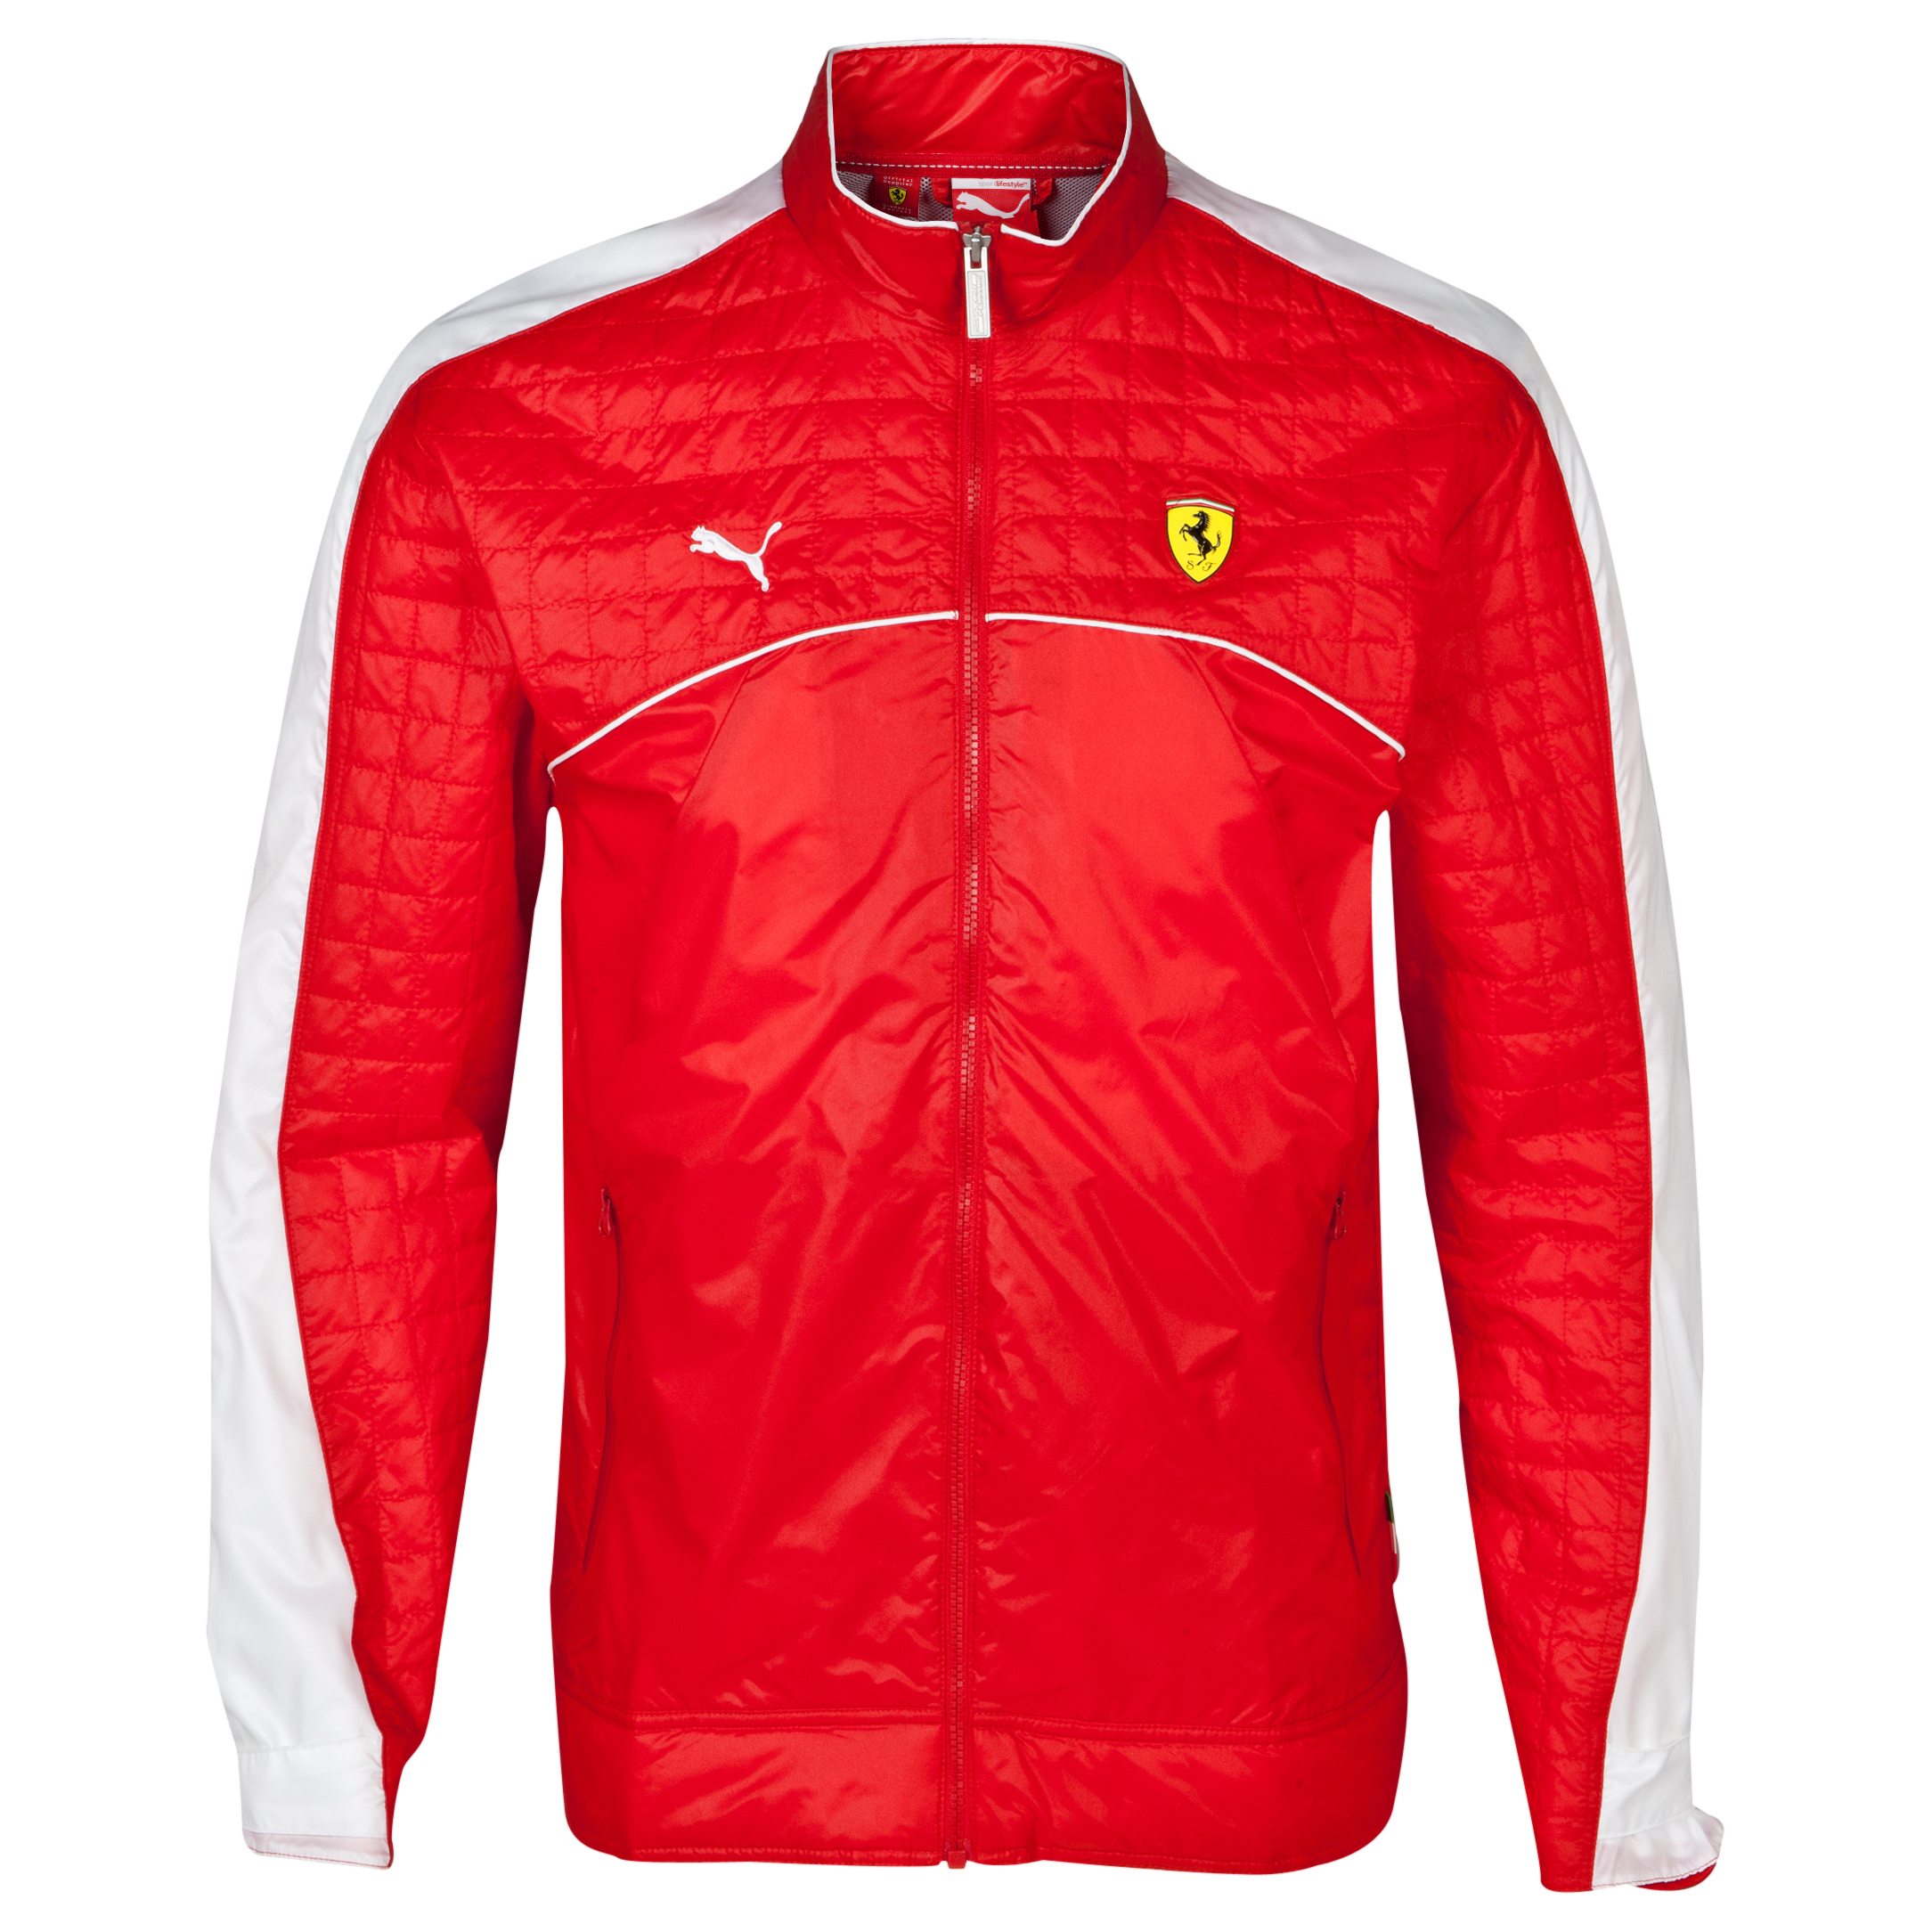 Scuderia Ferrari Lightweight Jacket - Rosso Corsa Red